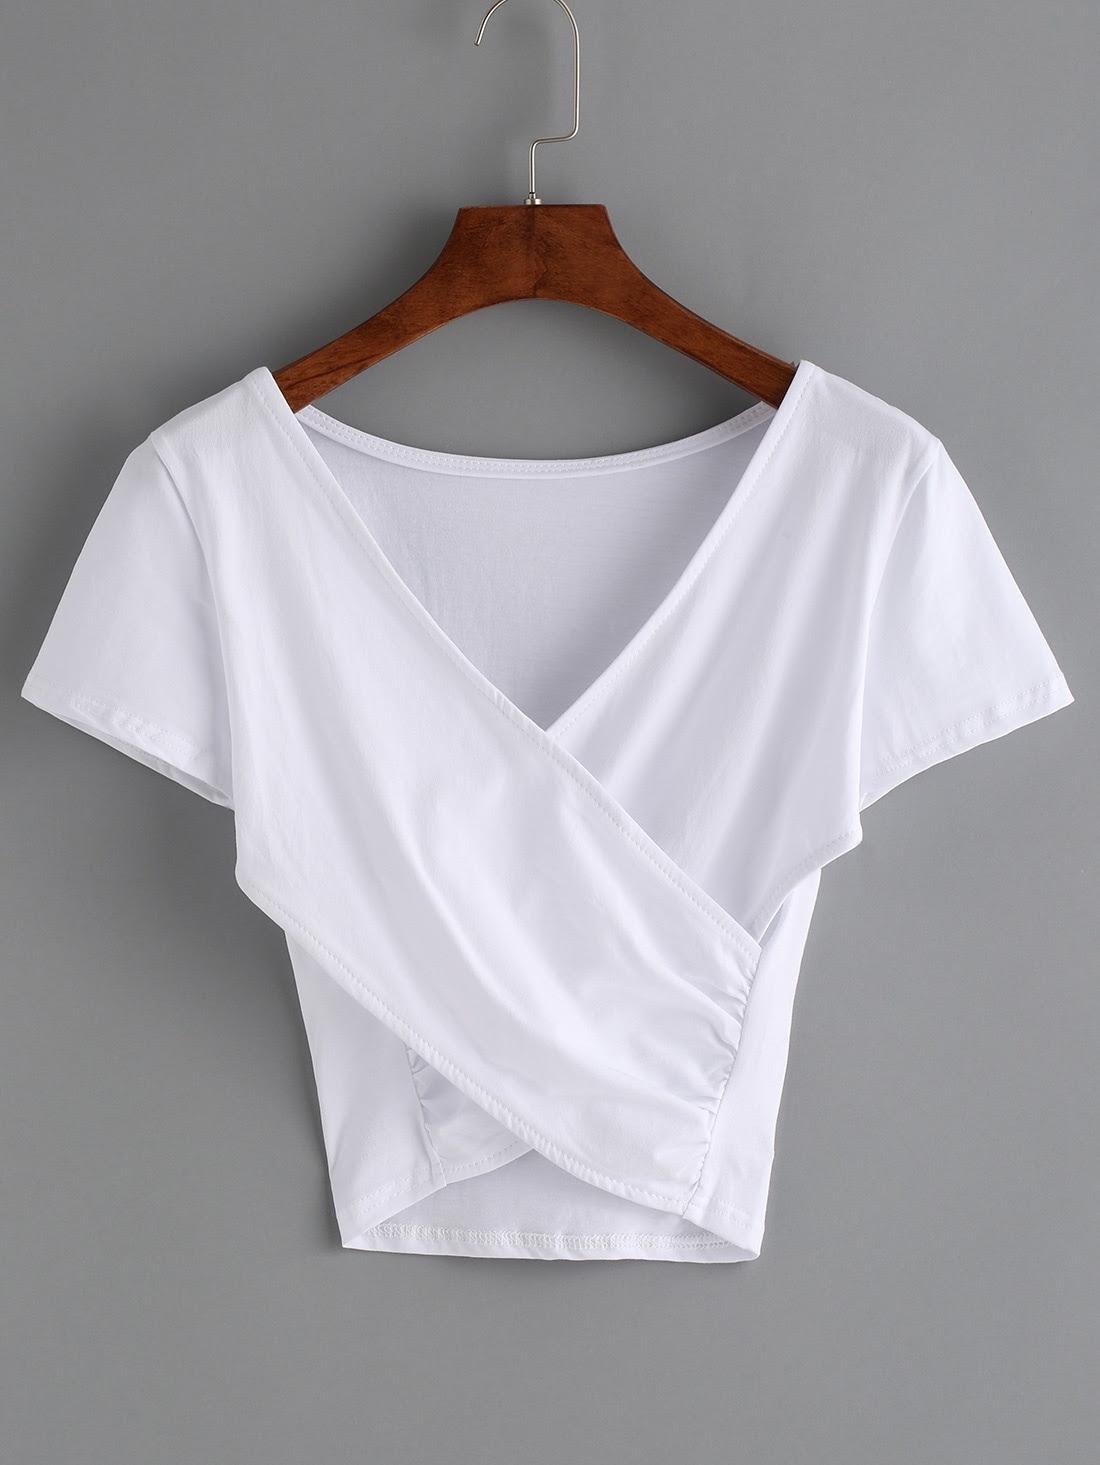 V Neck Floral Printed Short Sleeve Maxi Dresses size donation drop